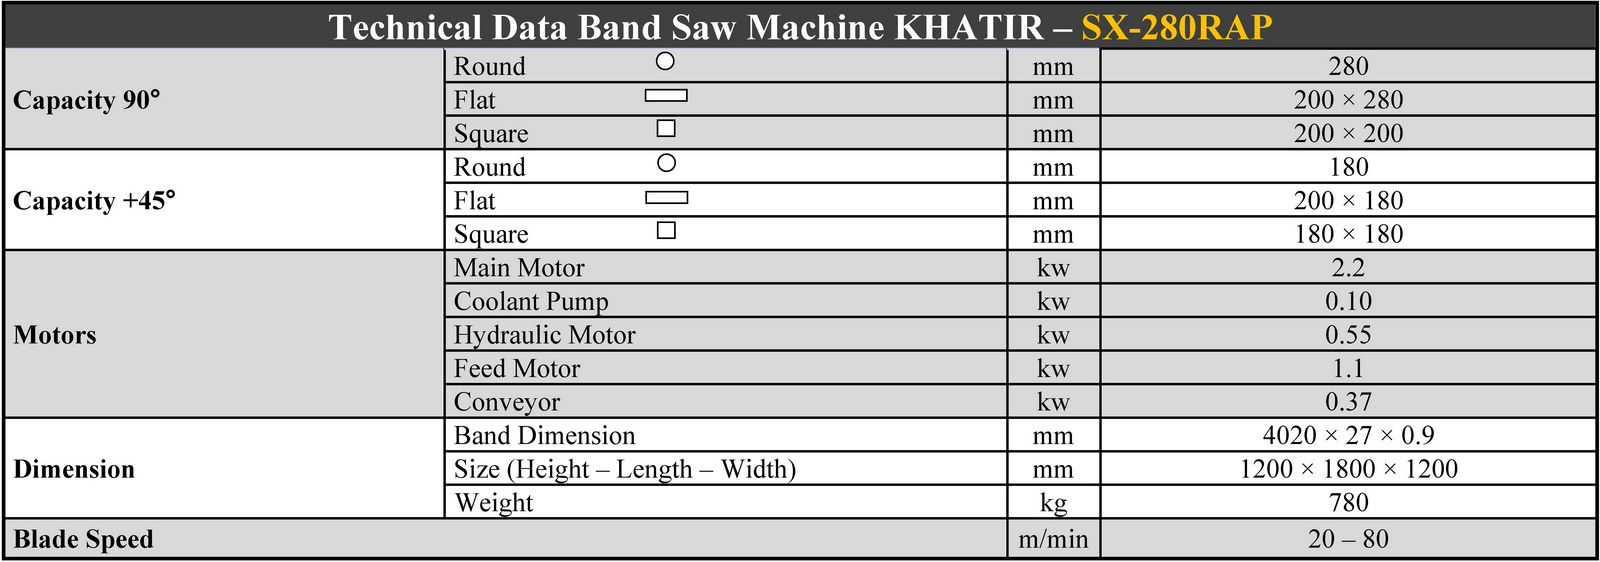 SX 280RAP - مشخصات فنی دستگاه اره نواری بازویی تمام اتوماتیک زاویه زن خطیر